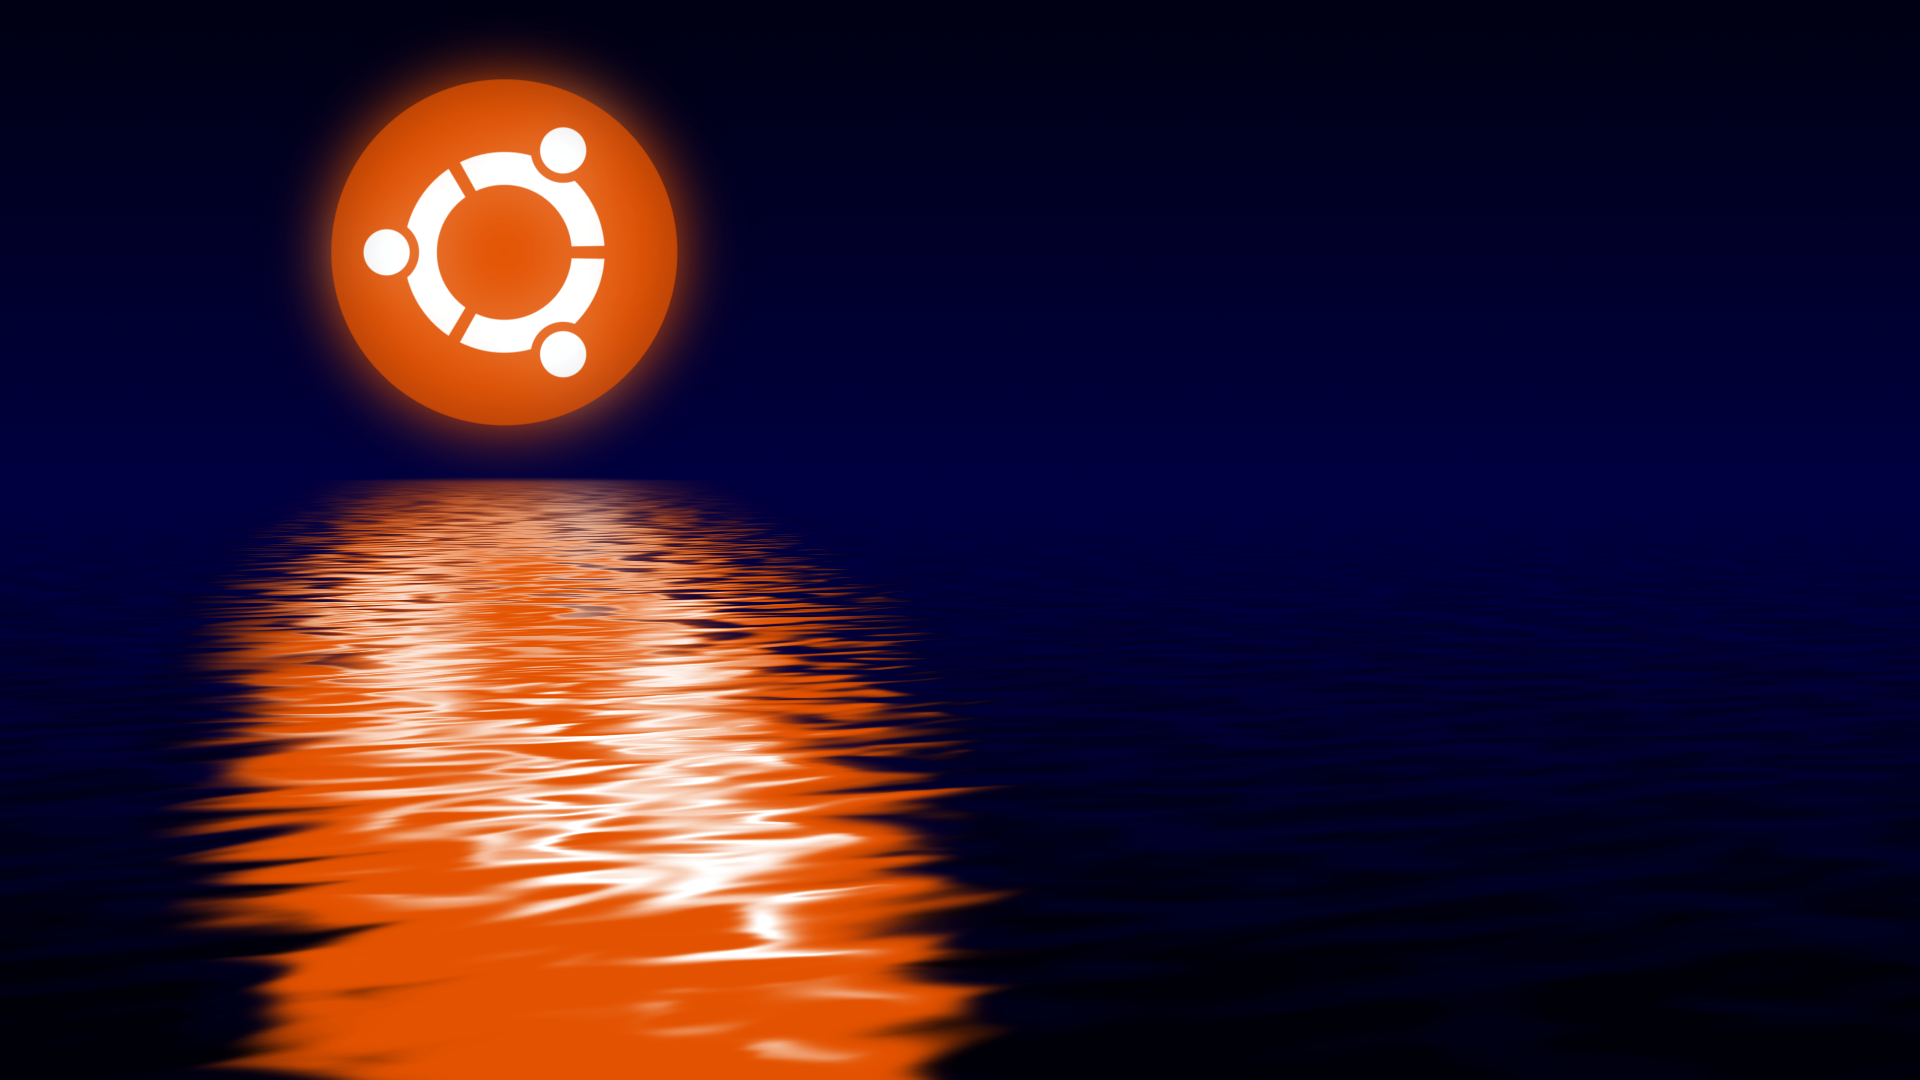 ubuntu-logo-water-1920x1080.png